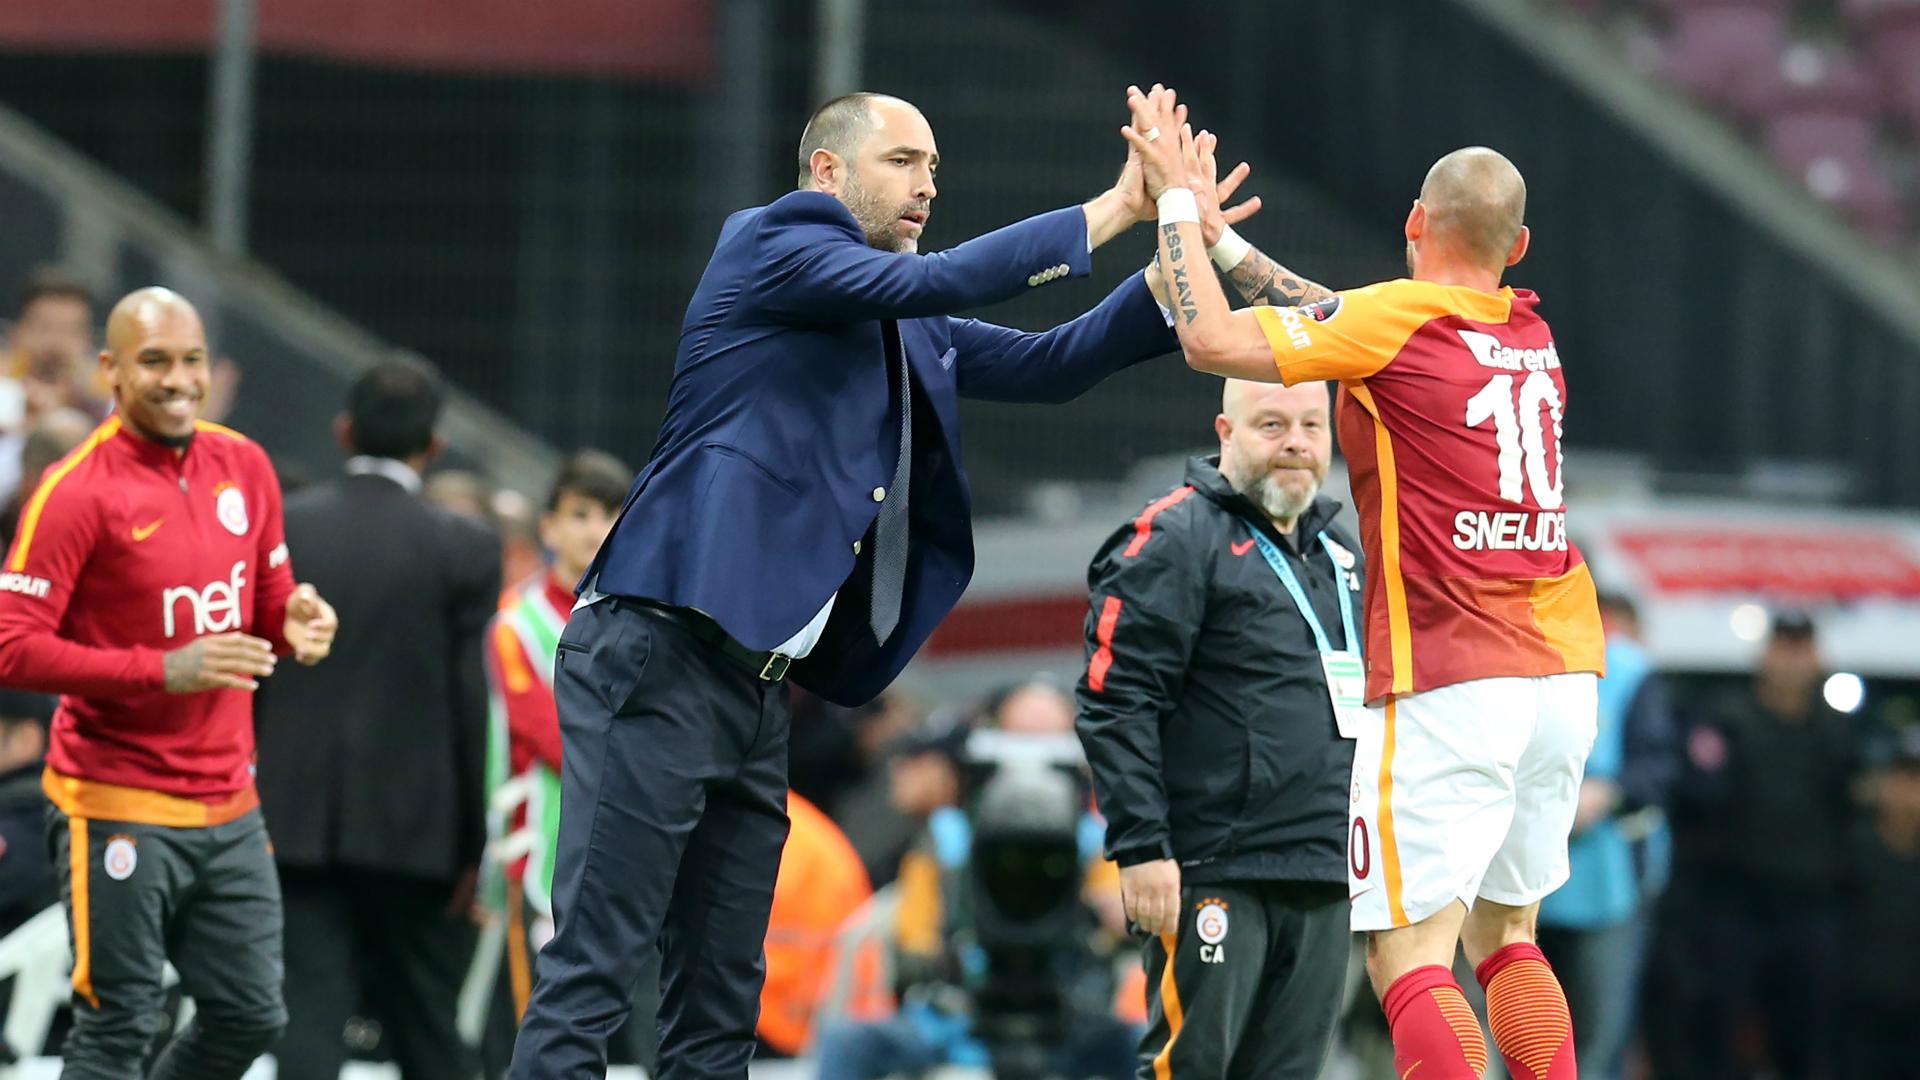 Galatasaray, Sneijder: